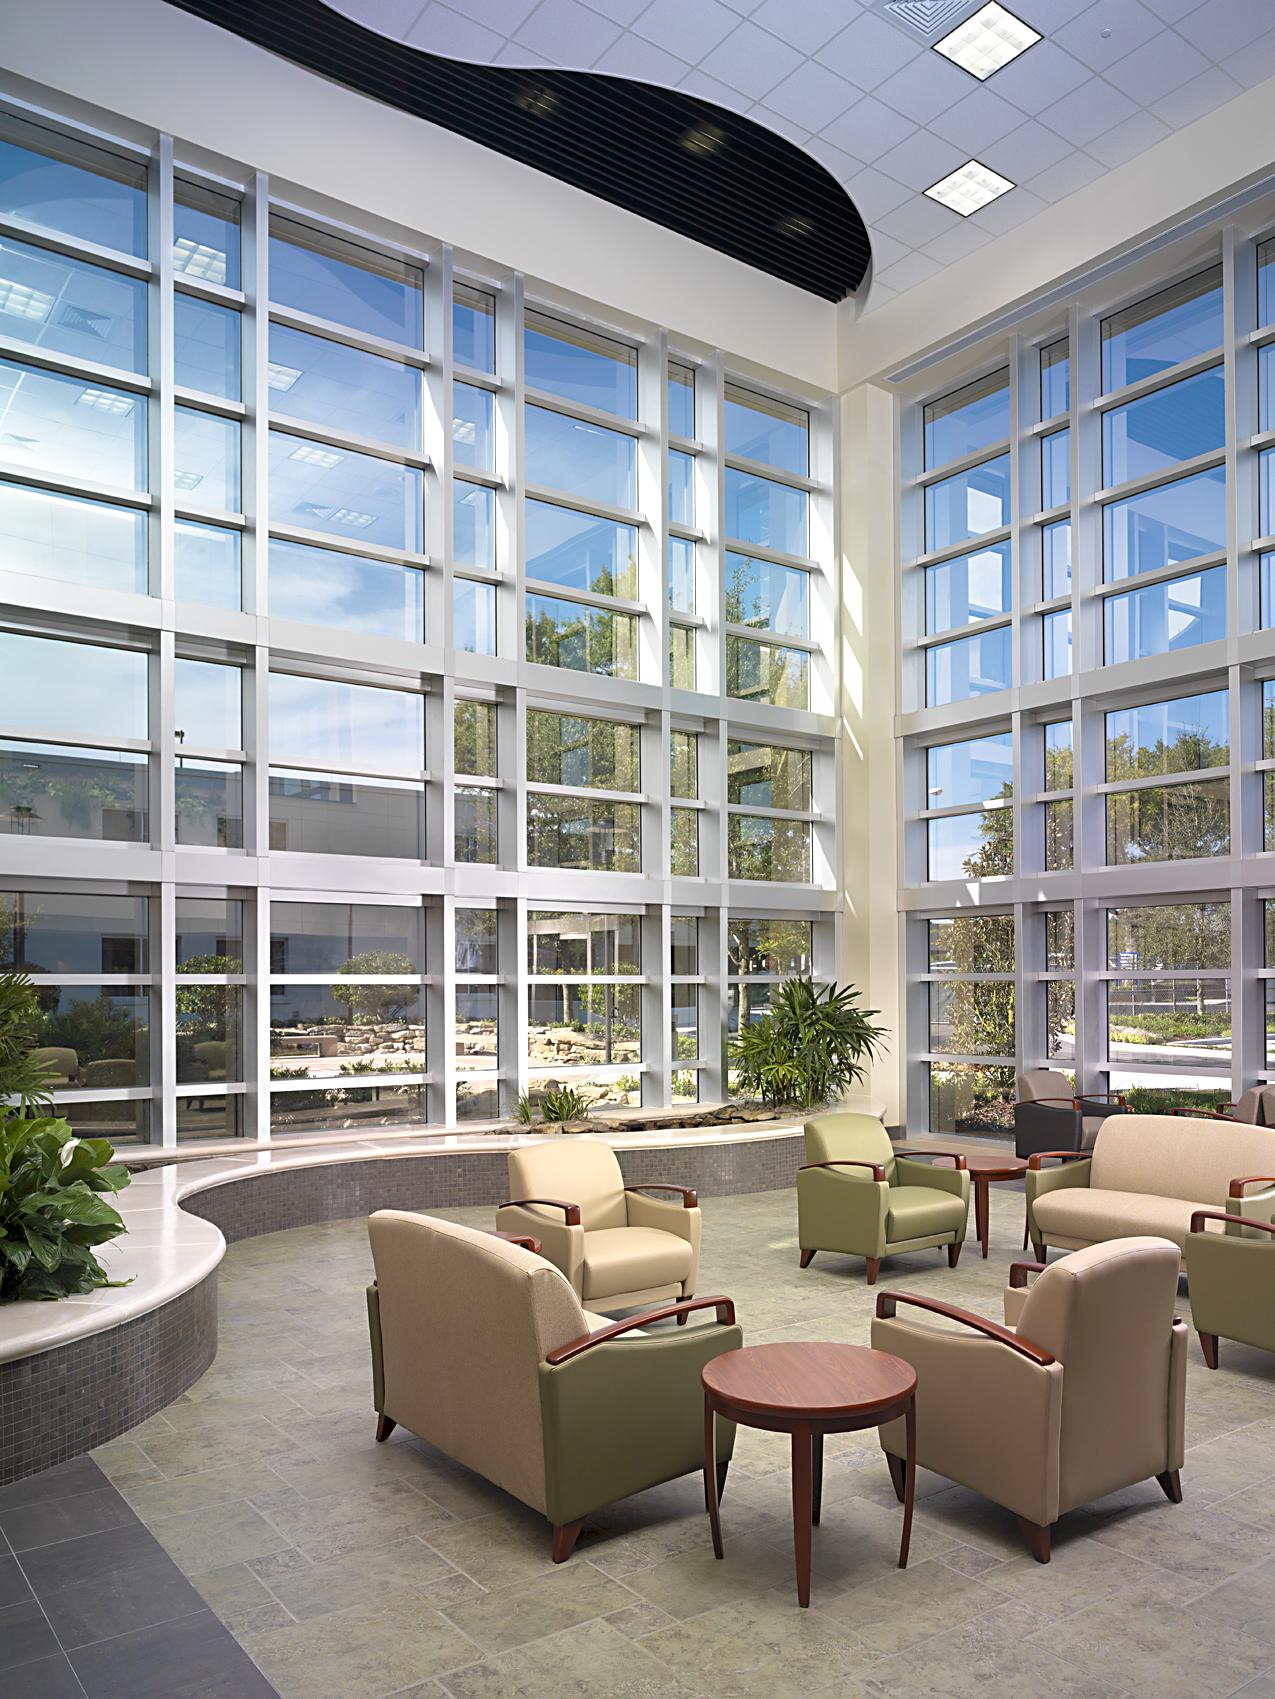 Winter Haven Hospital West Expansion